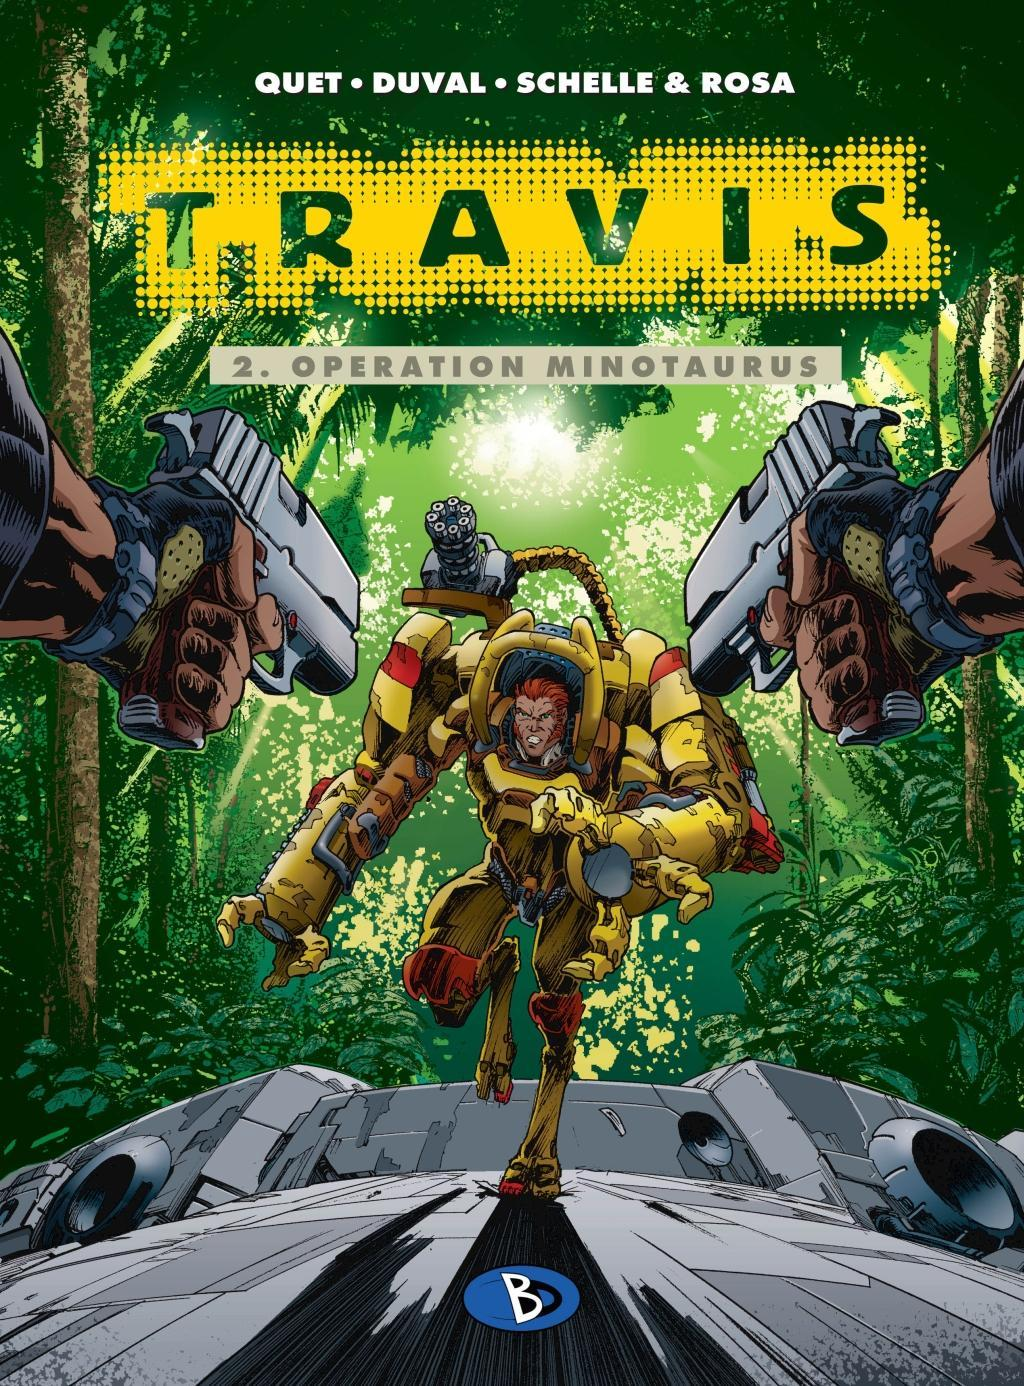 Travis 02. Operation Minotaurus Fred Duval